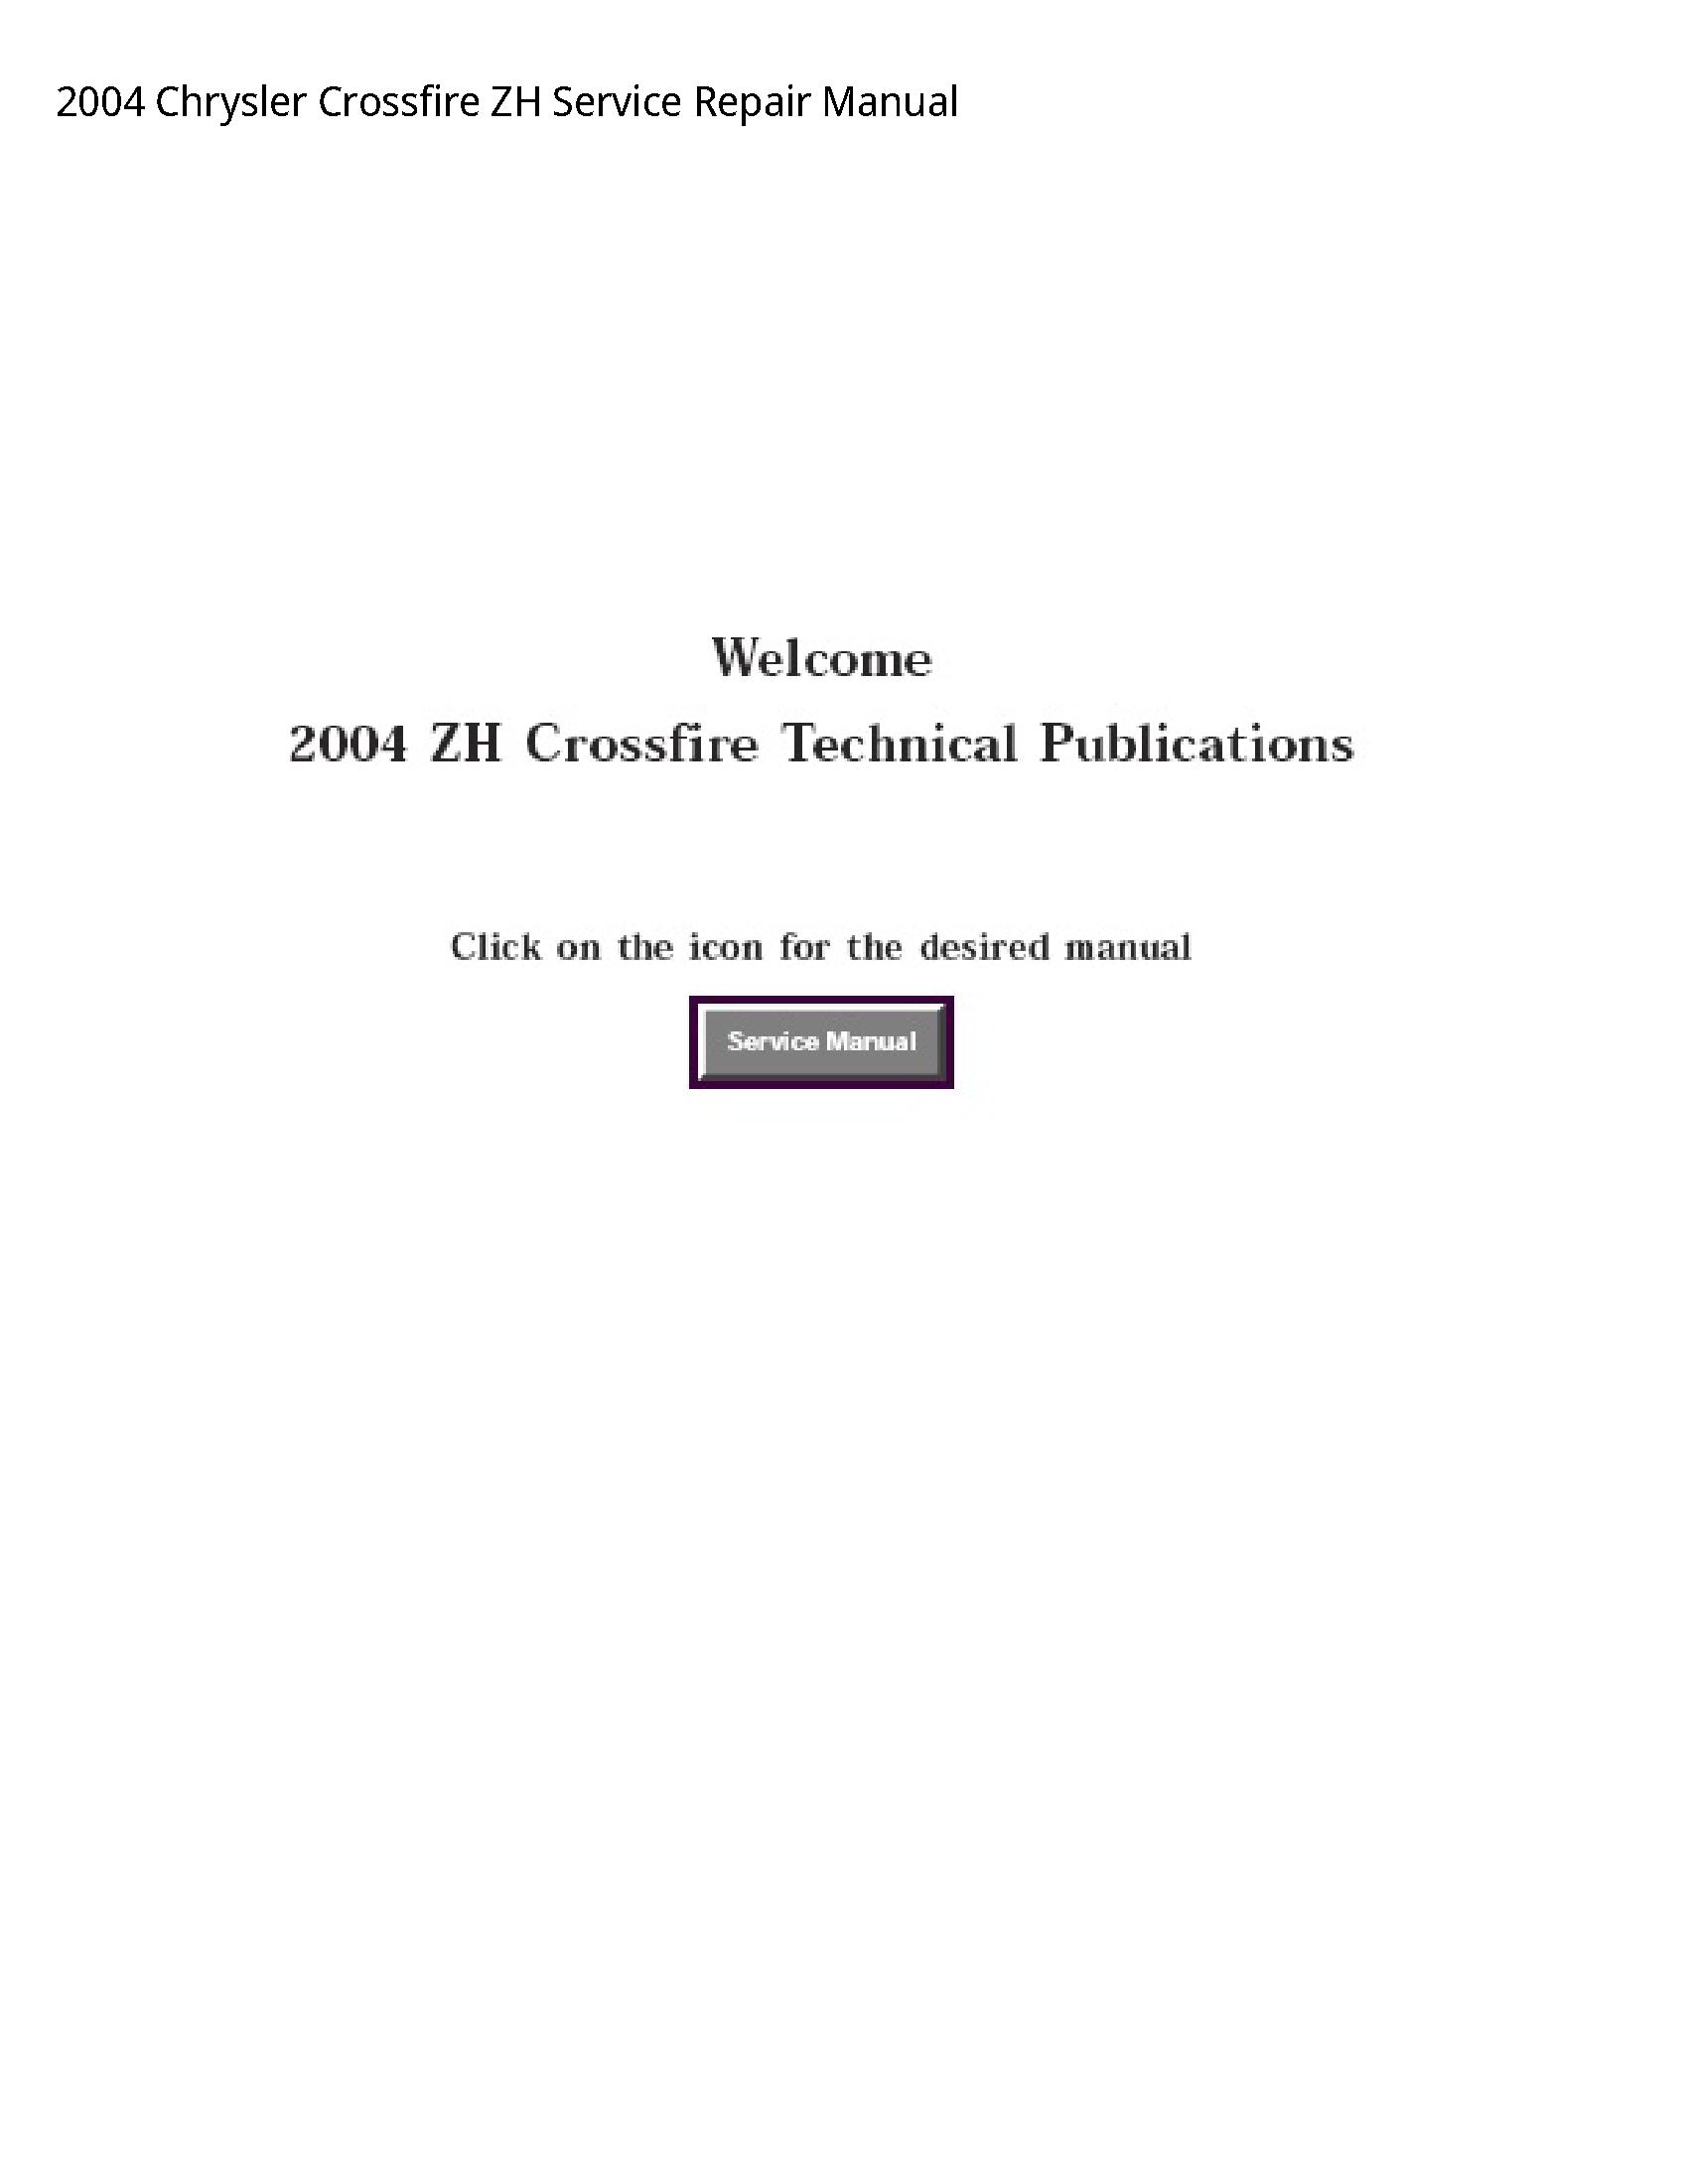 Chrysler Crossfire ZH manual